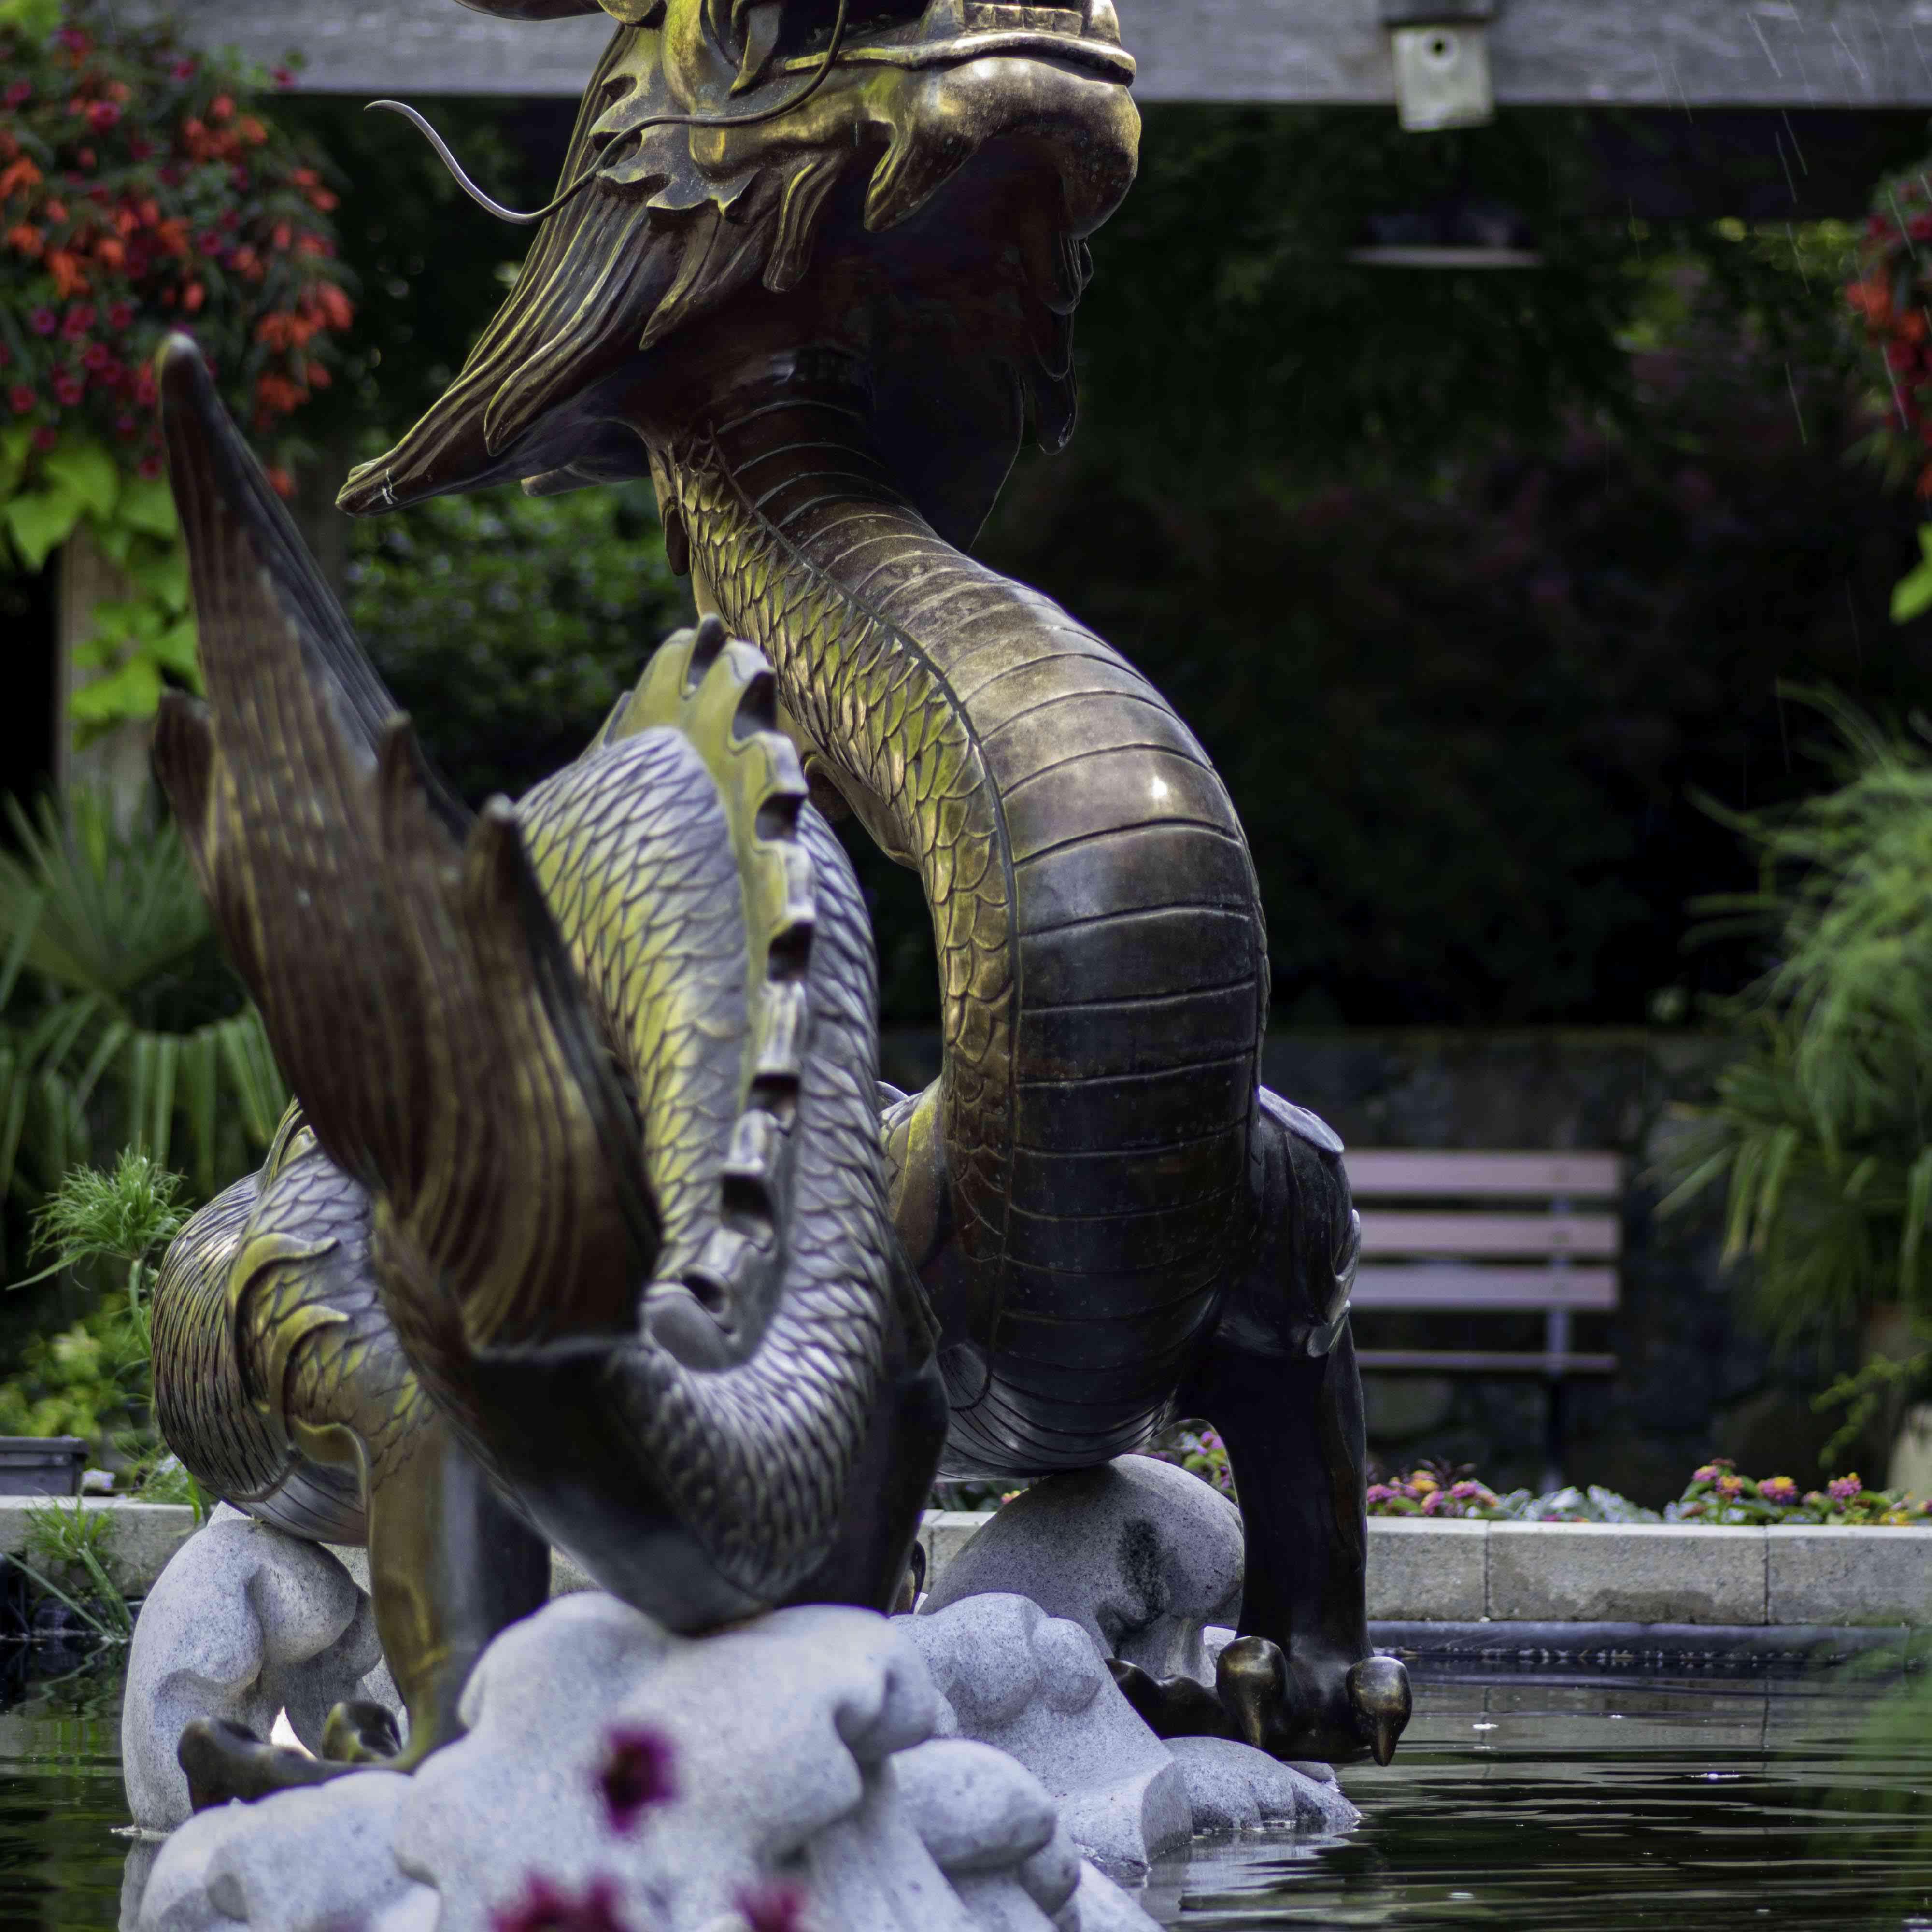 A dragon statue fountain at Butchart Gardens